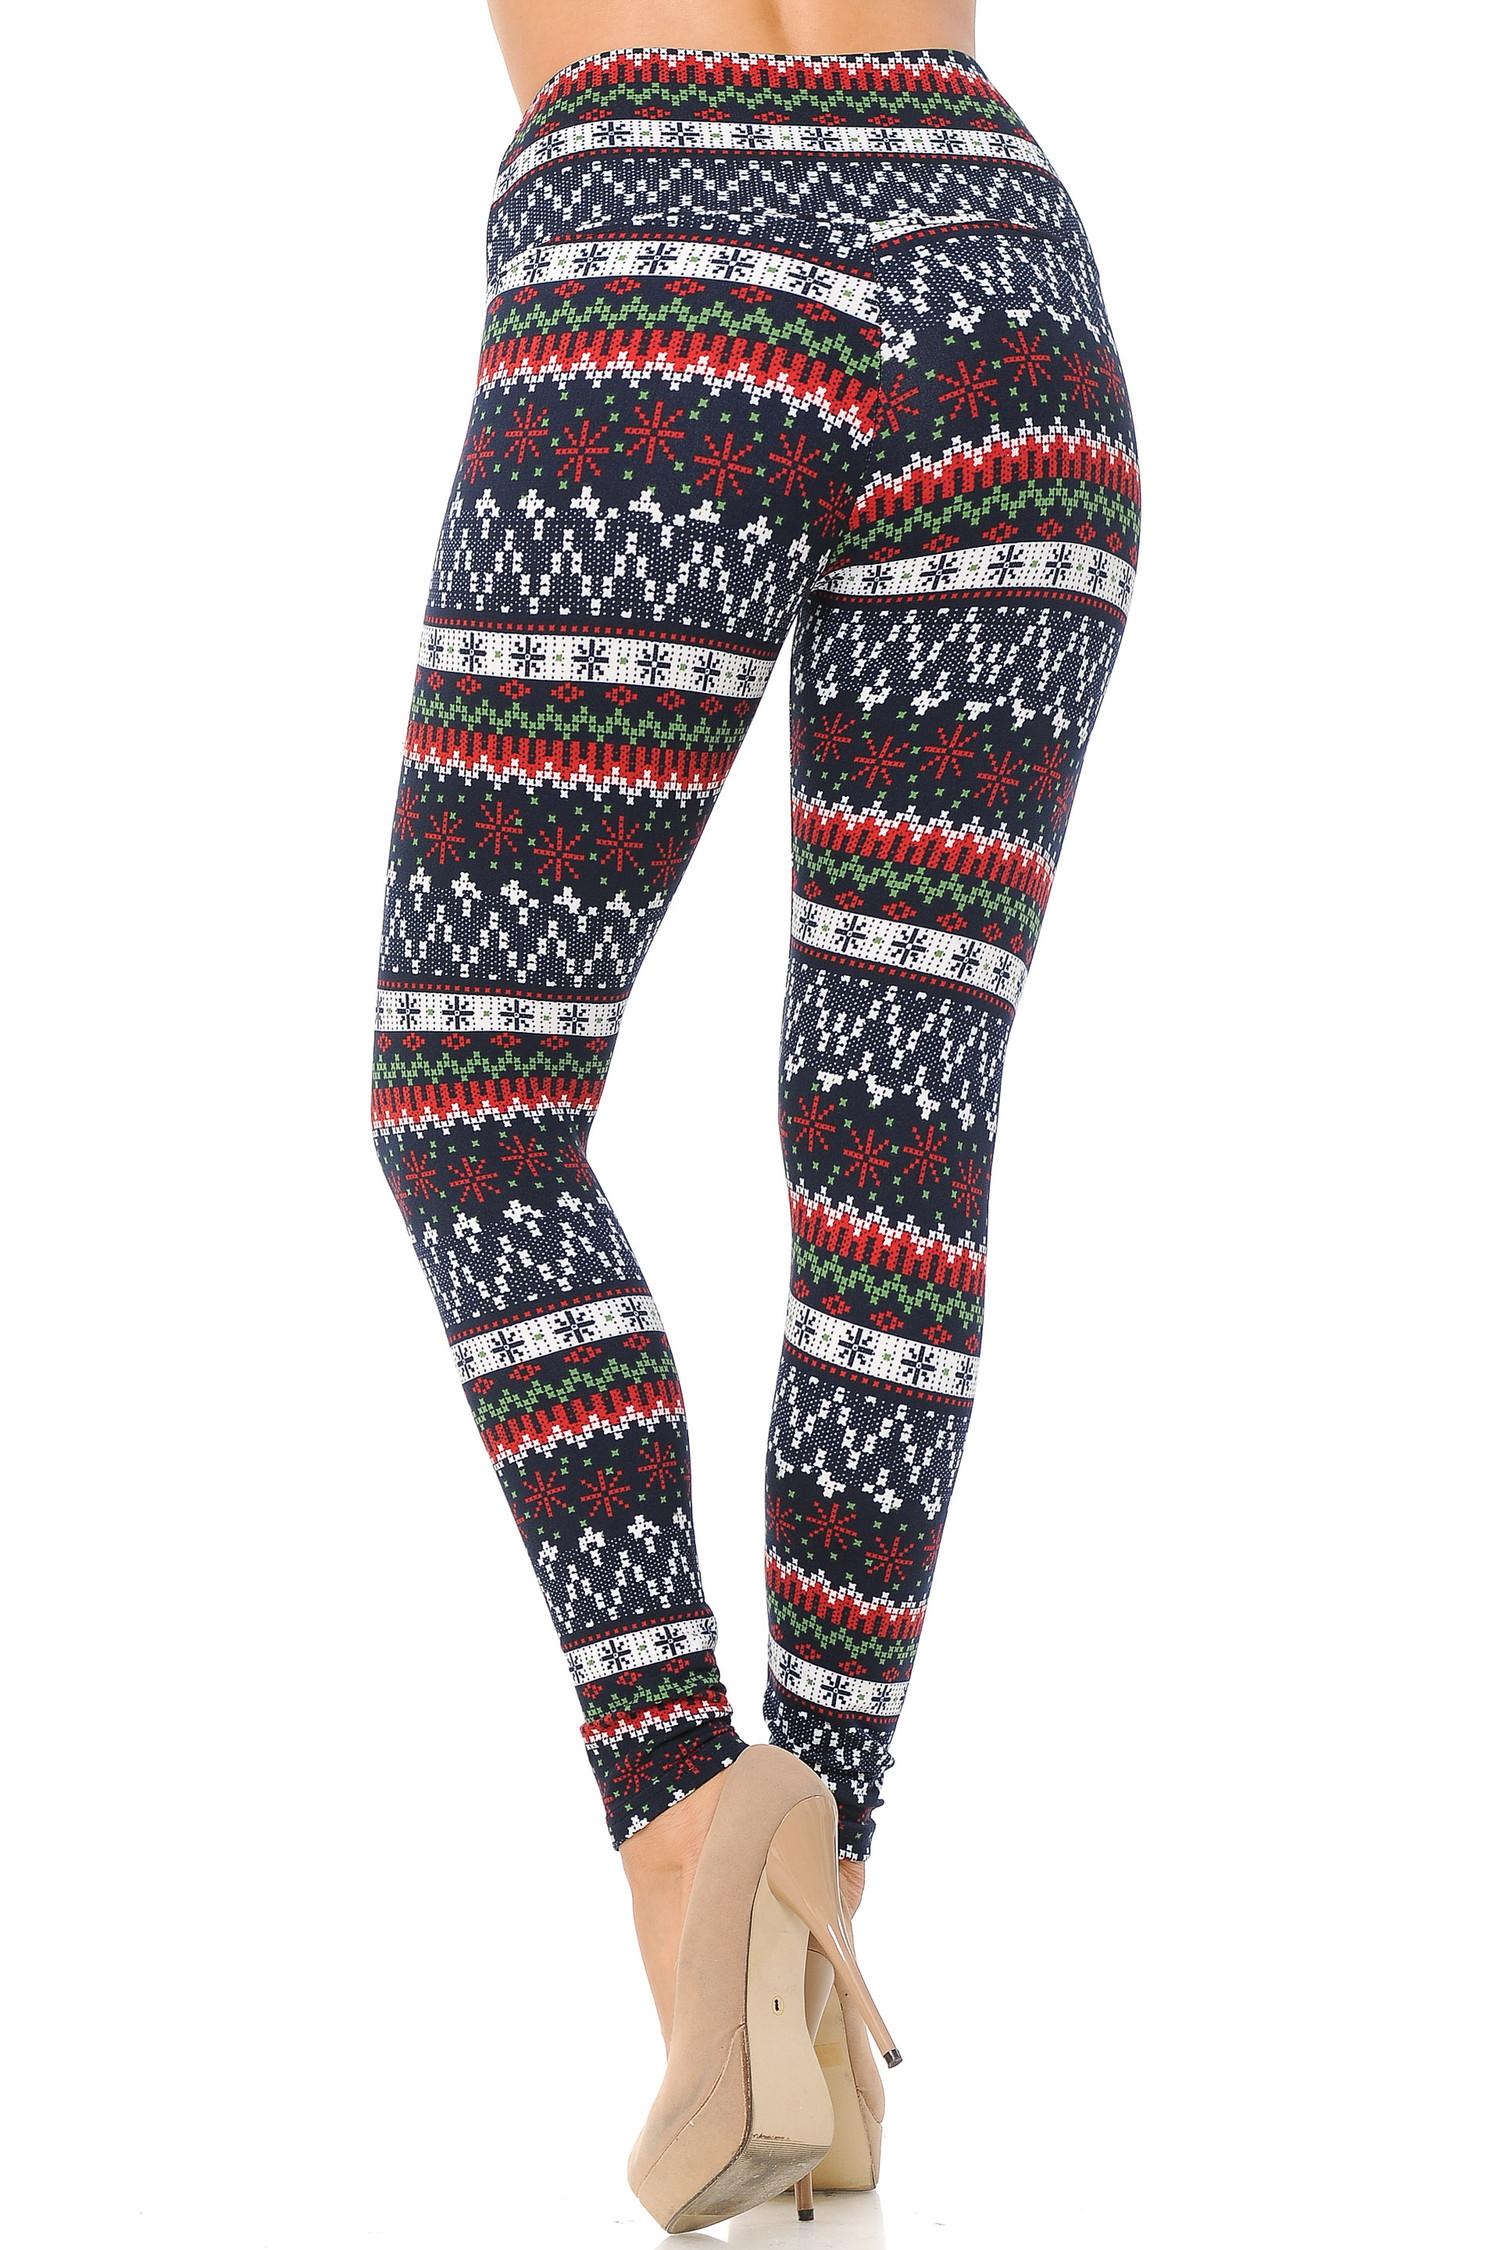 Burgundy Snowflakes High Waisted Fleece Lined Leggings